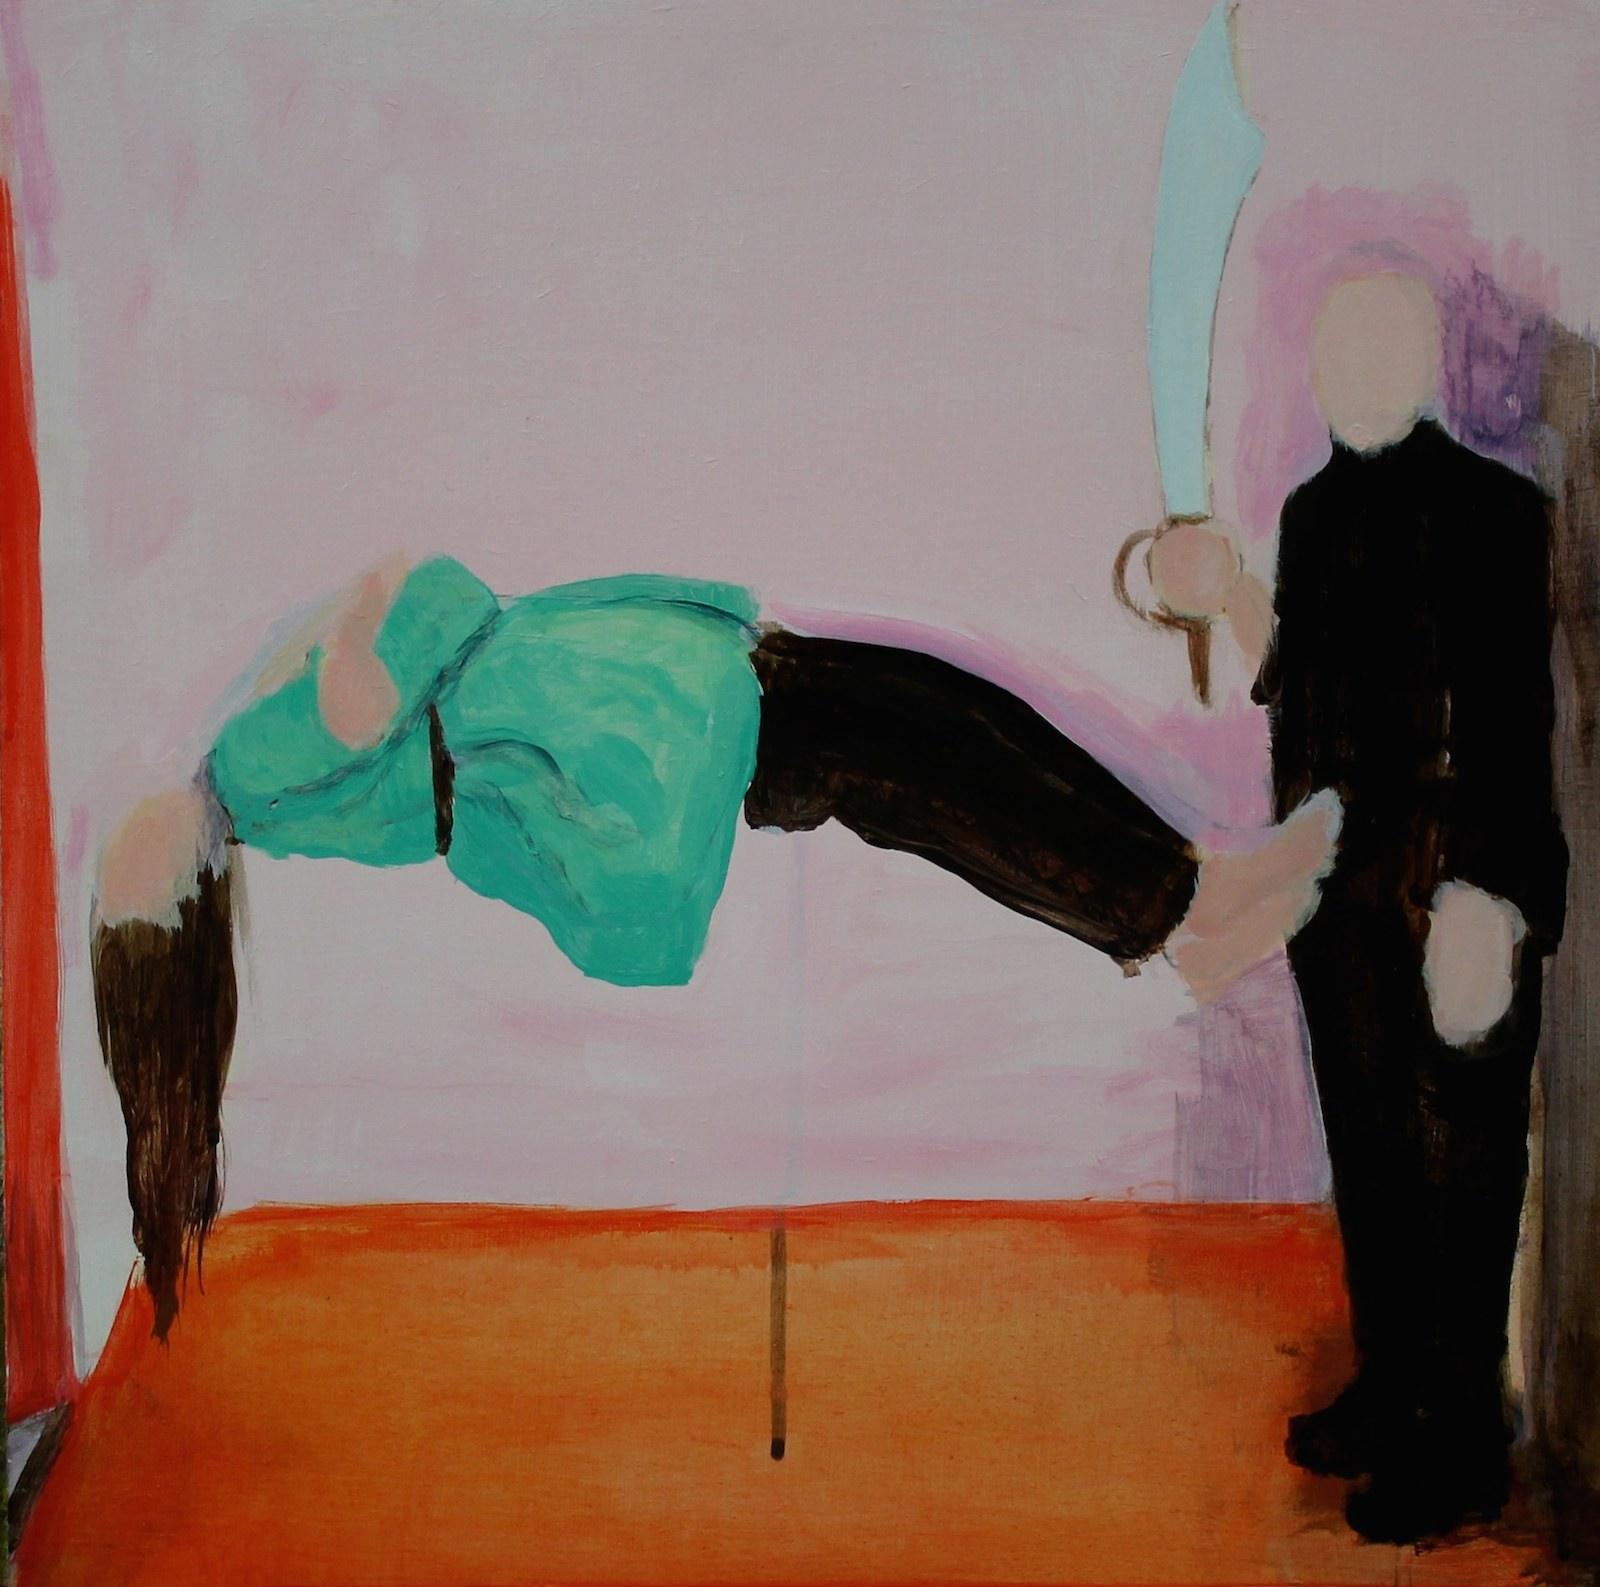 Magician – Priest, Achill, 1971 40 cm x 40 cm, acrylic on mdf, 2019